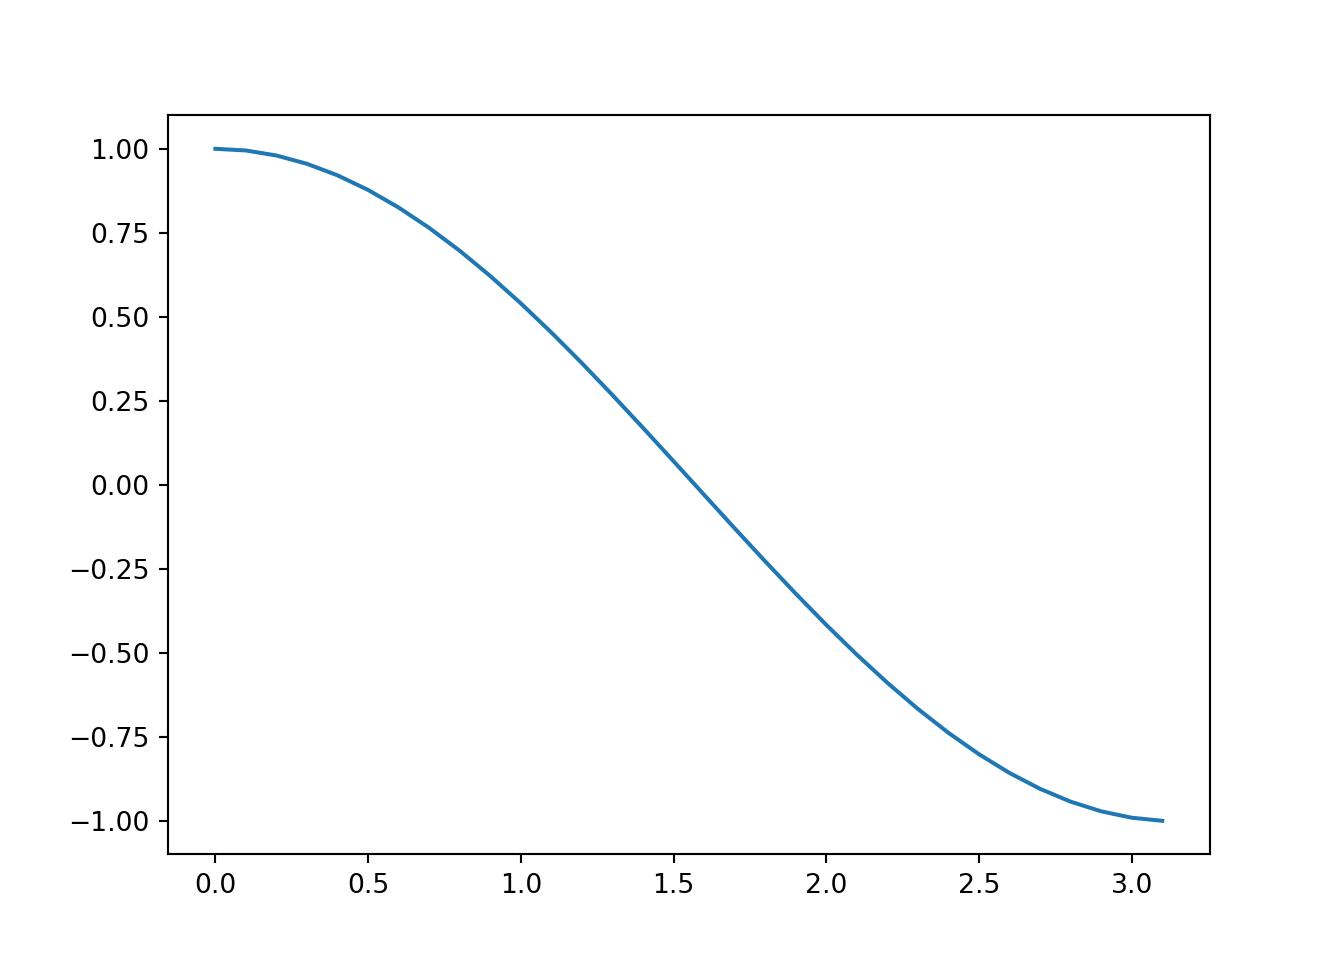 A cosine function